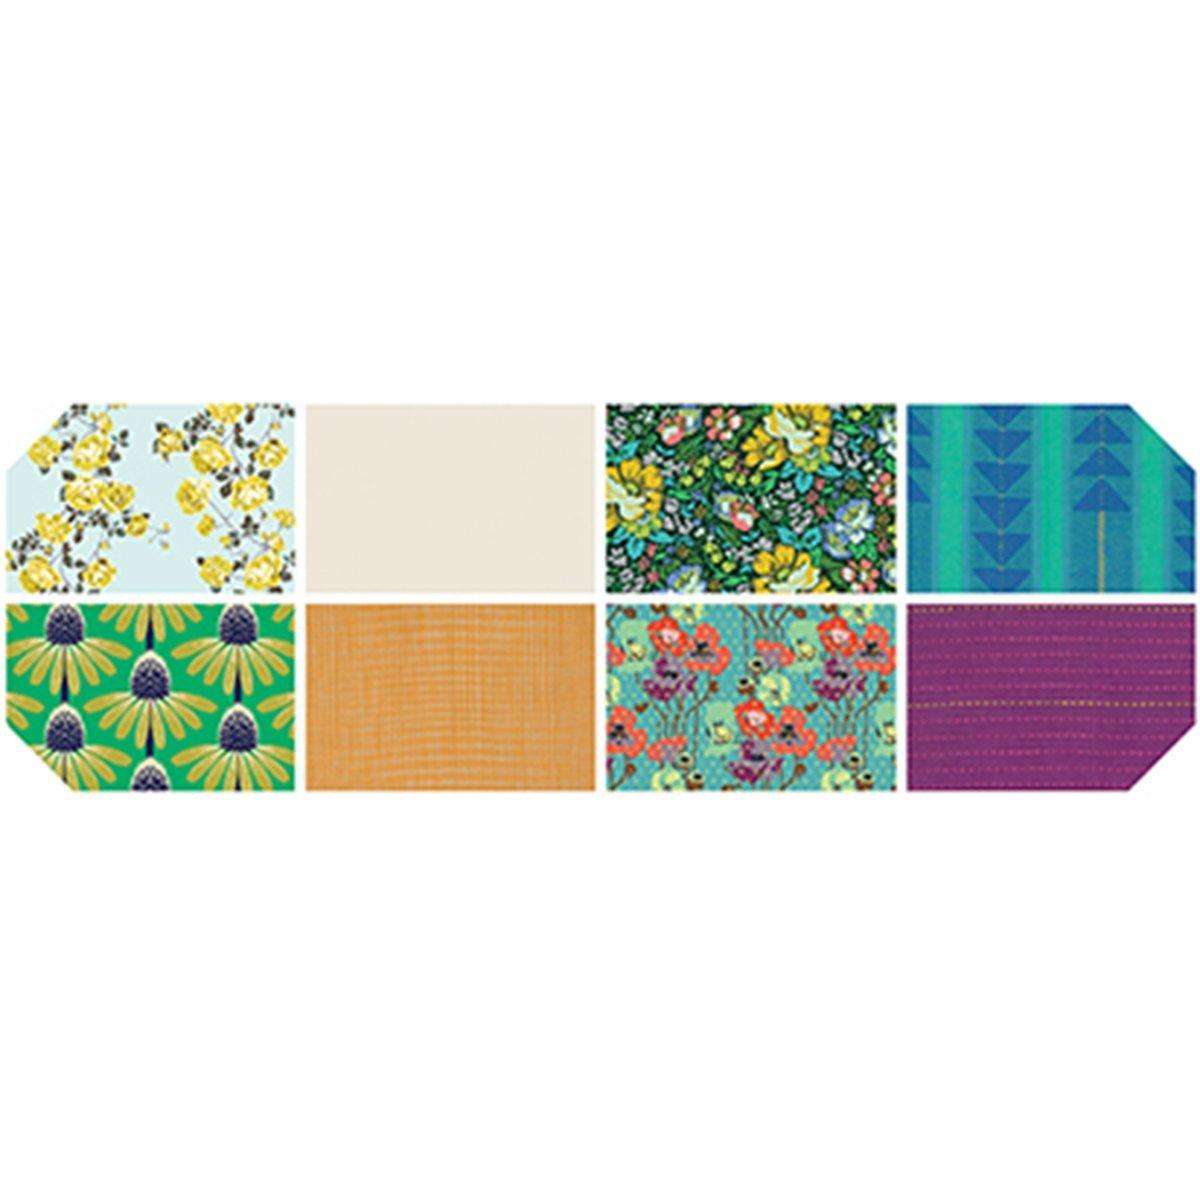 מארז רבעים שמנים - Anna Maria Horner - Floral Retrospective - 8pcs - Morning